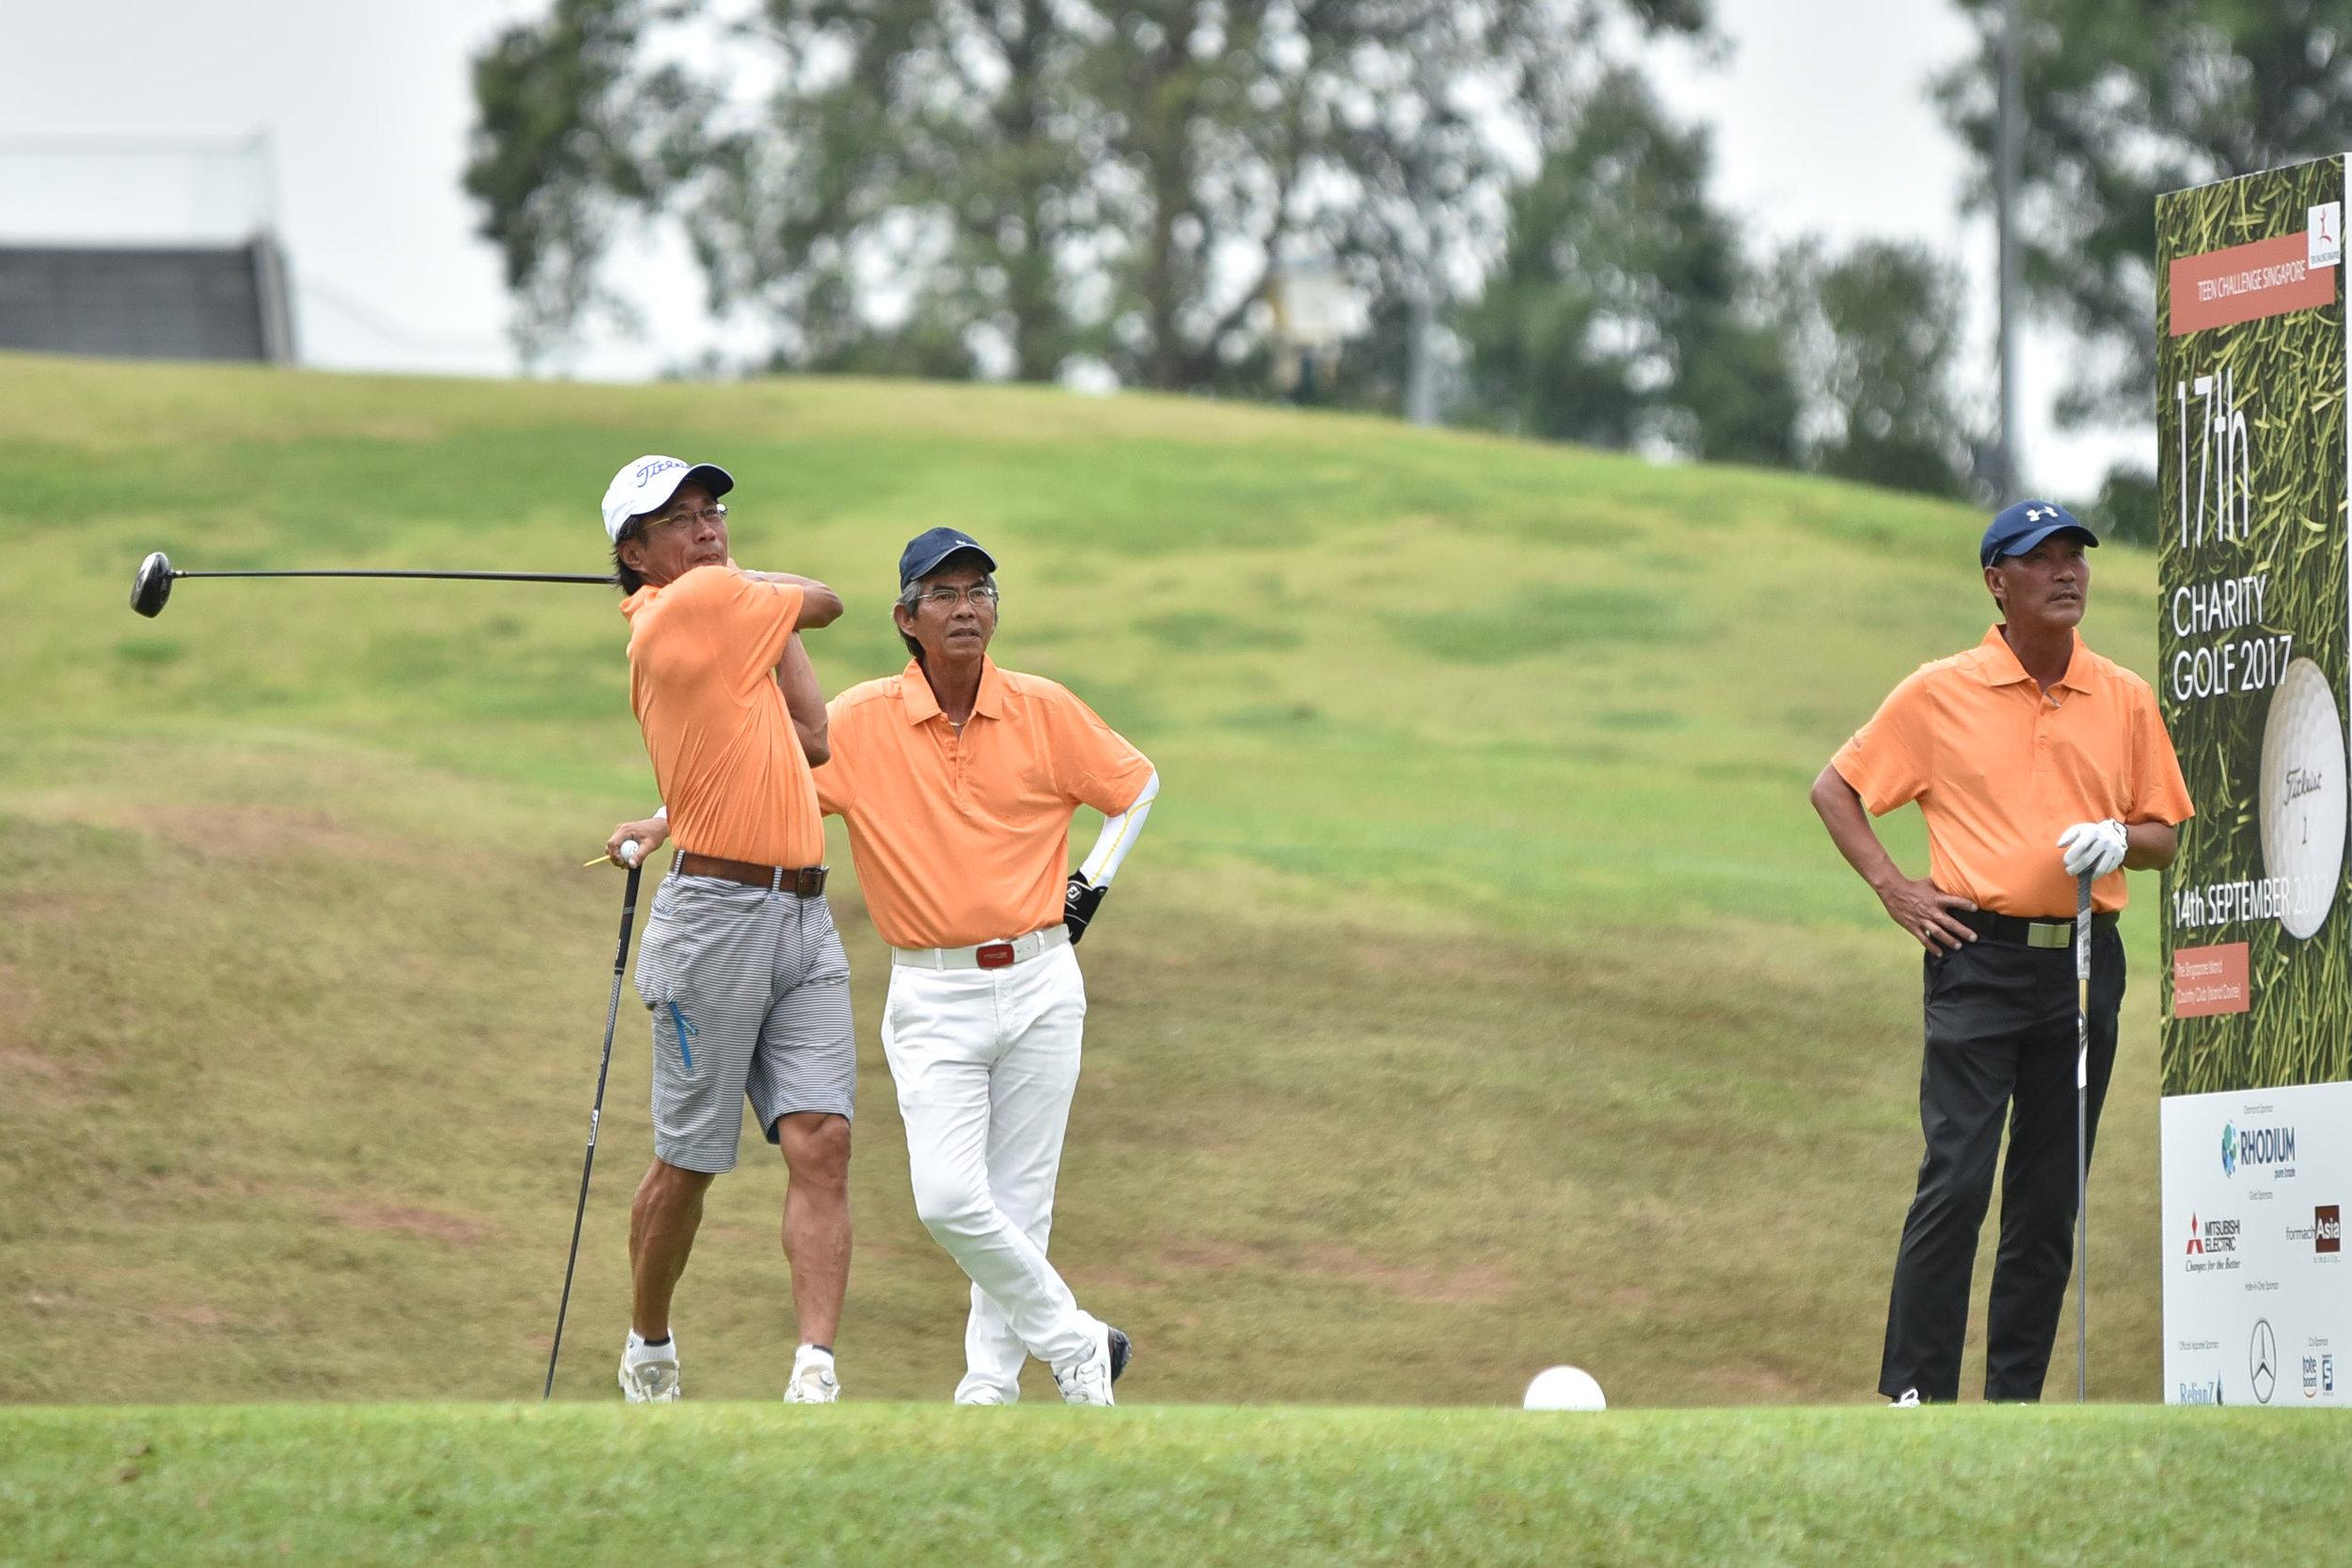 TC-golf0248.JPG